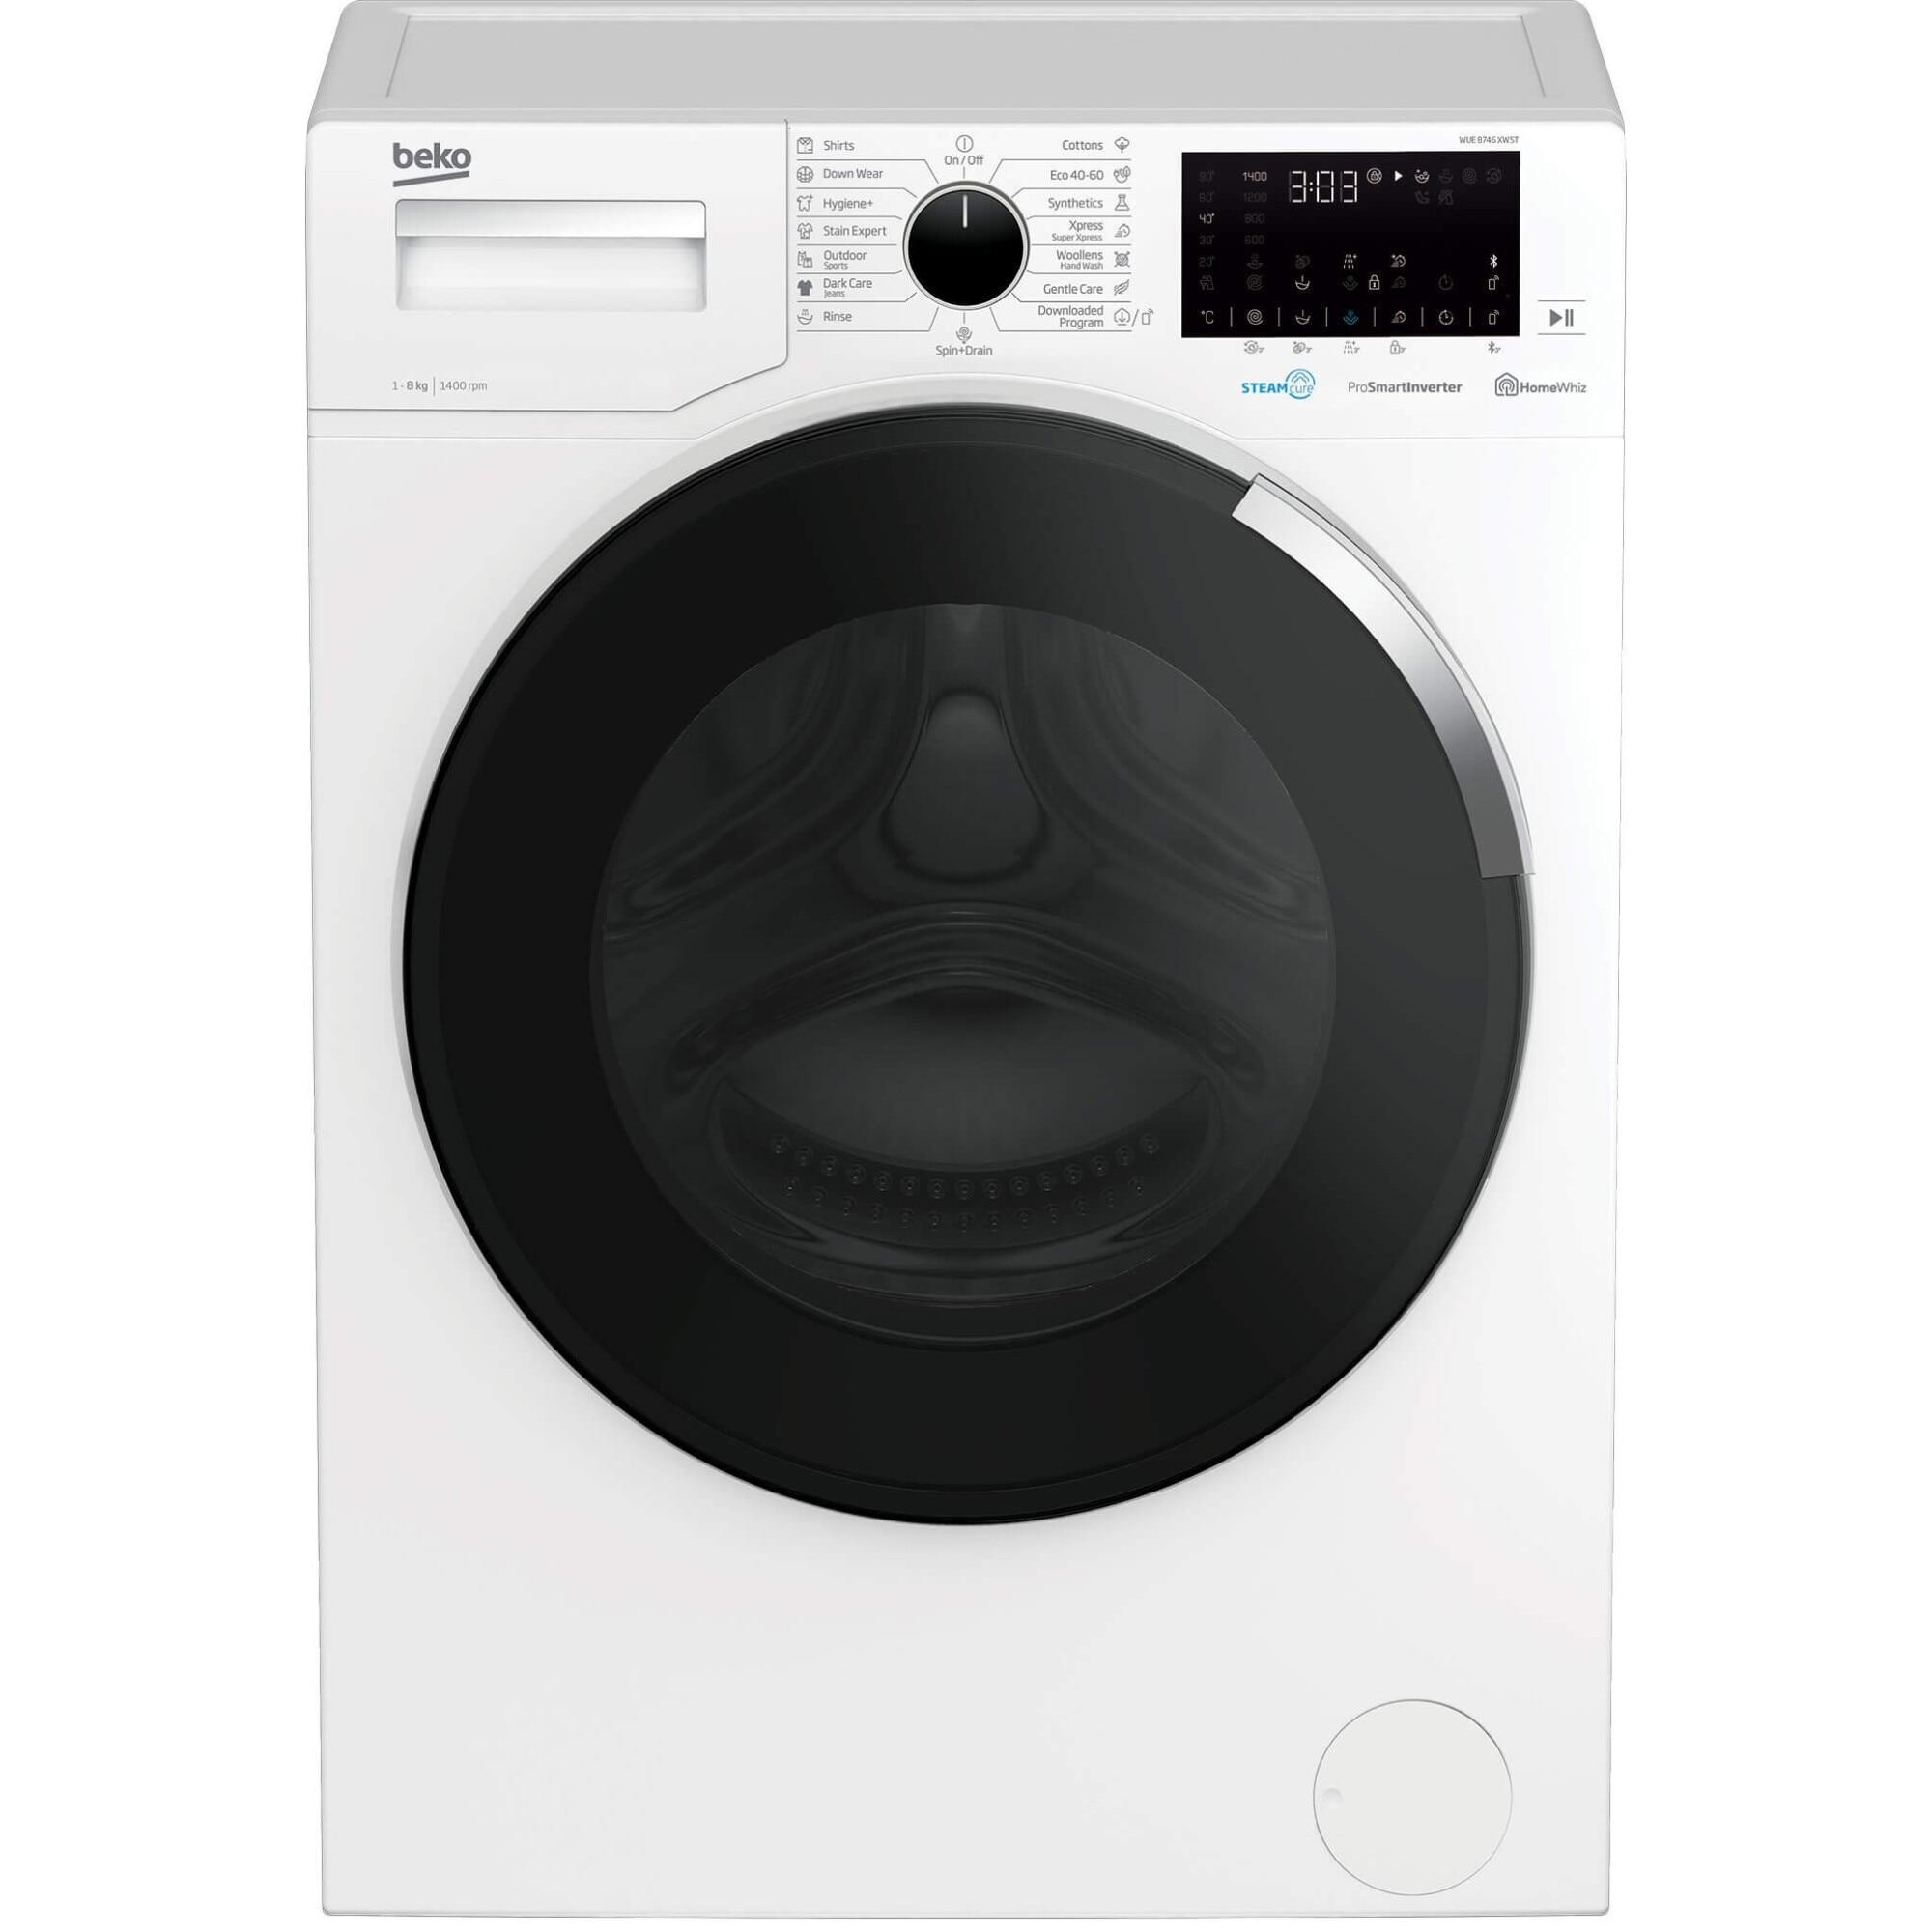 Fotografie Masina de spalat rufe Beko WUE8746XWST, 8 kg, 1400 RPM, Clasa C, HomeWhiz, Bluetooth Remote Control, SteamCure, Motor ProSmart Inverter, Alb